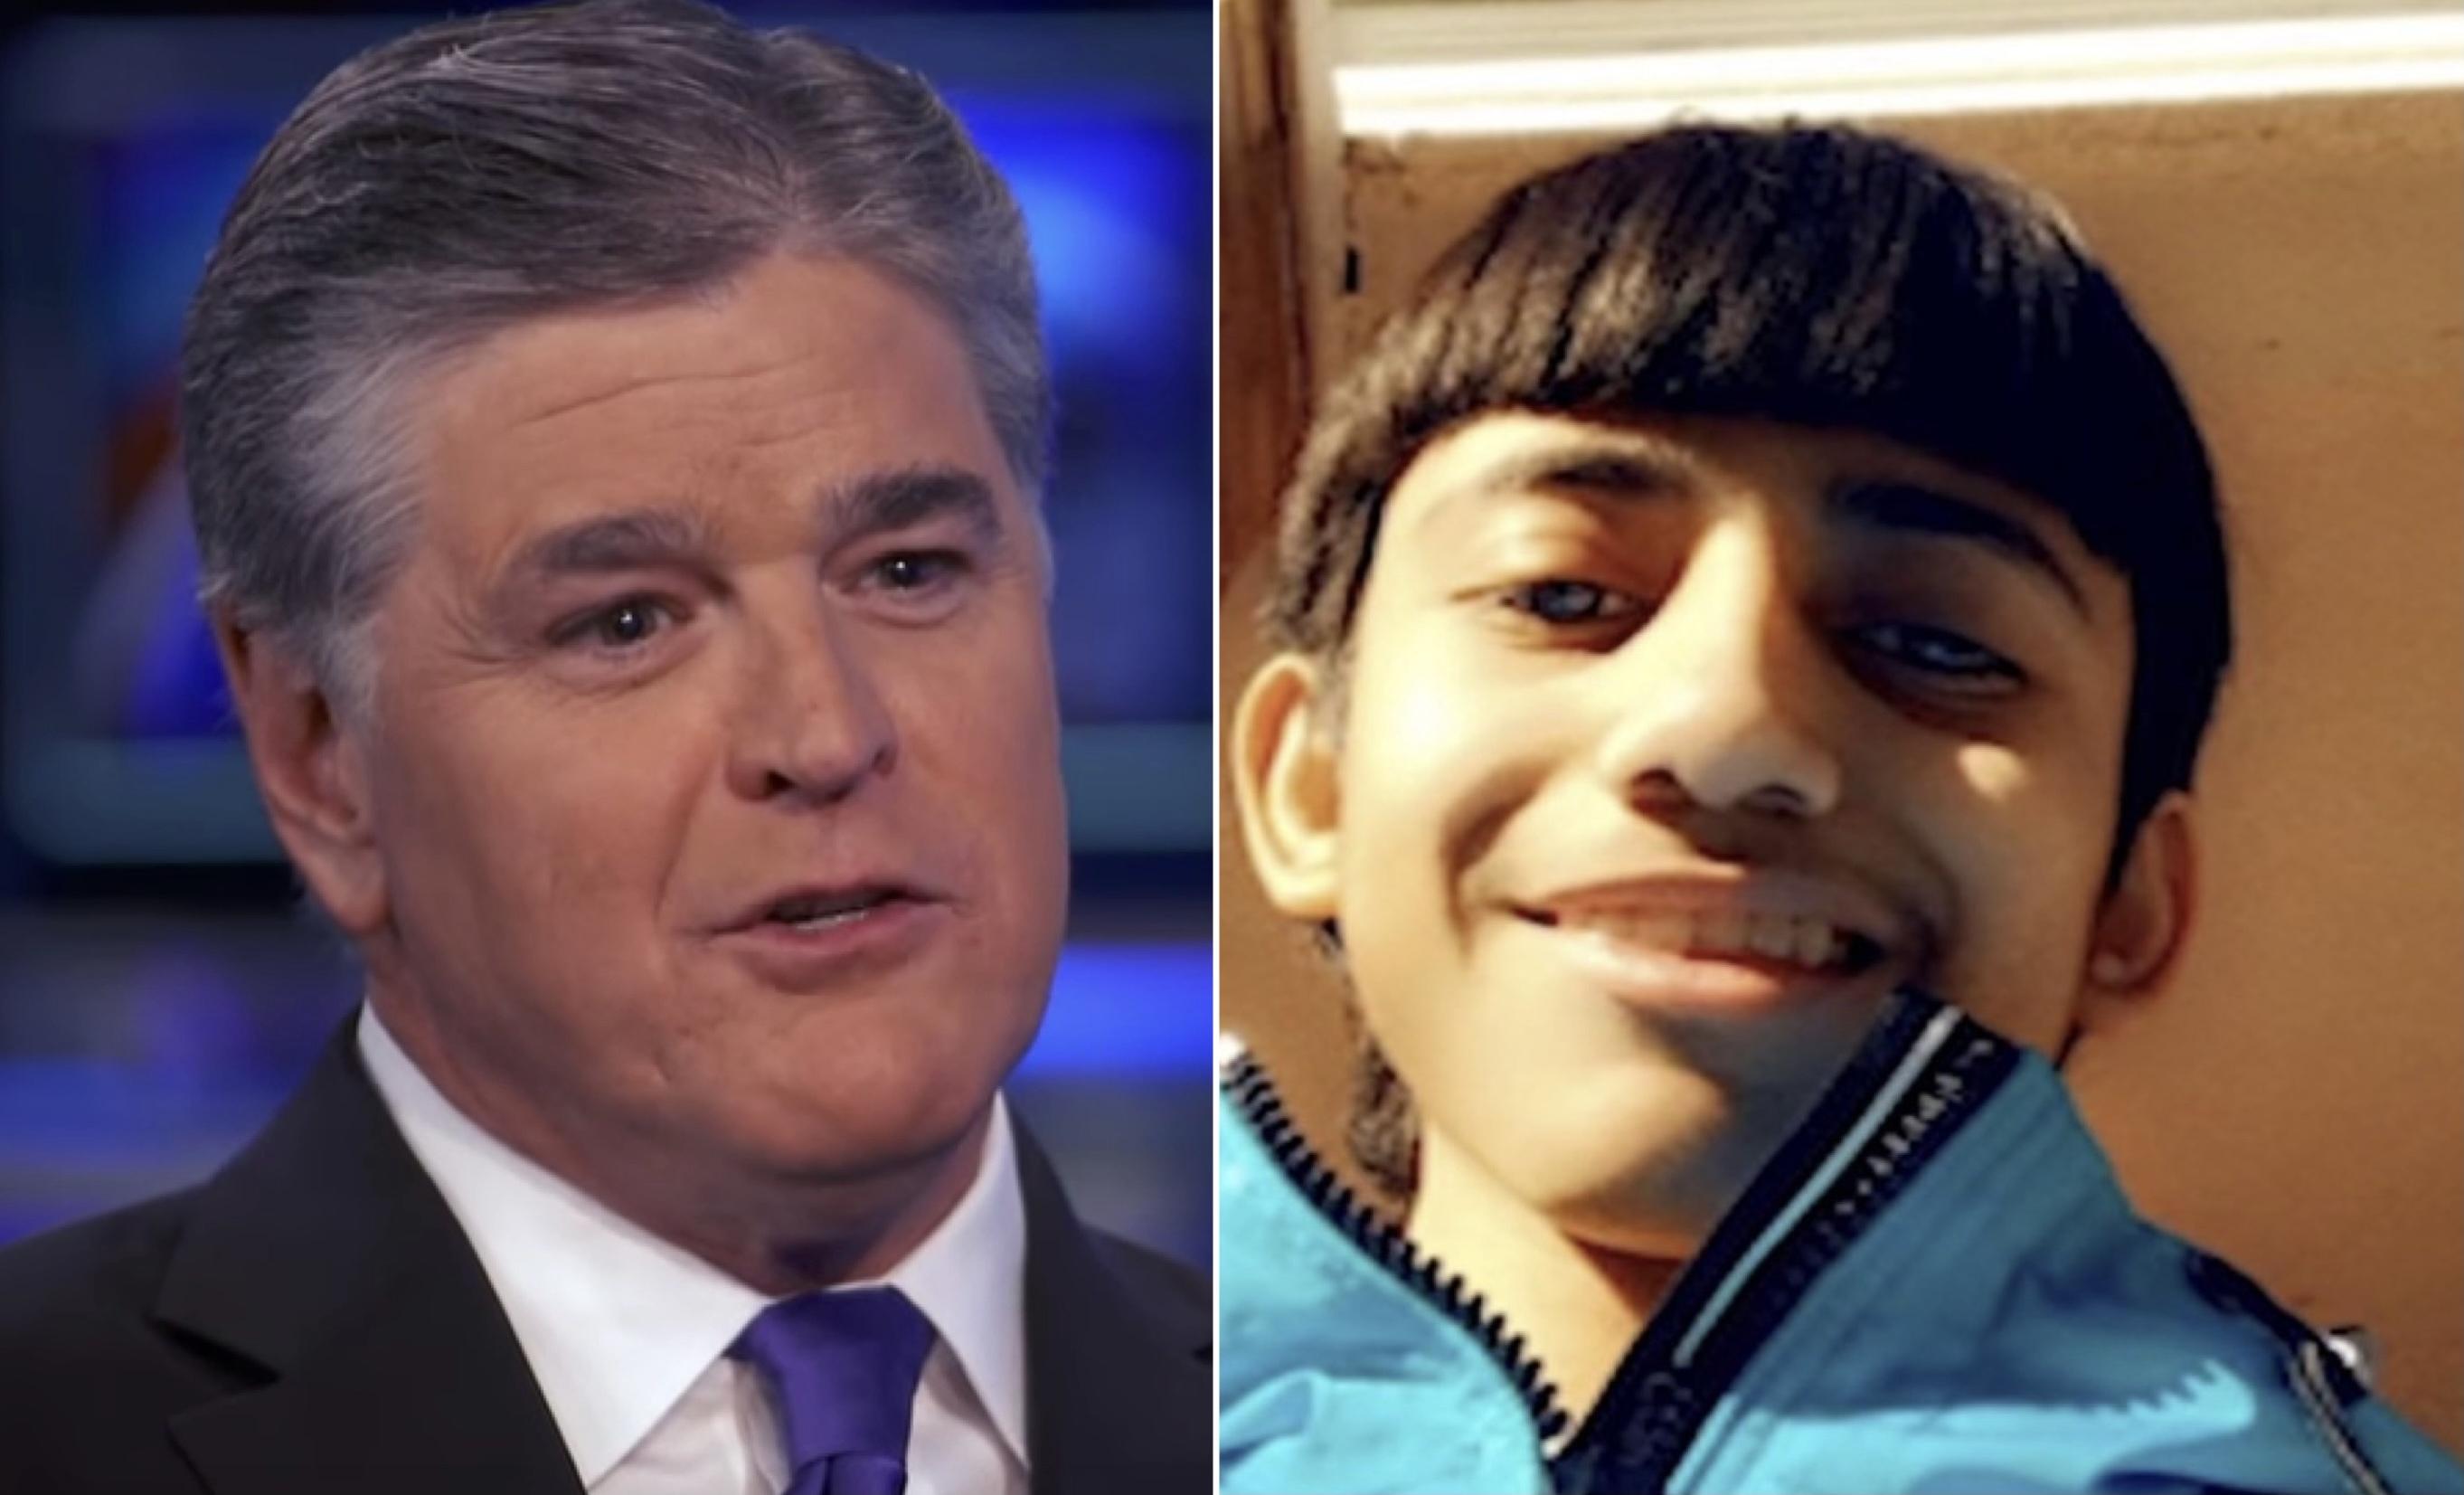 Sean Hannity and Adam Toledo